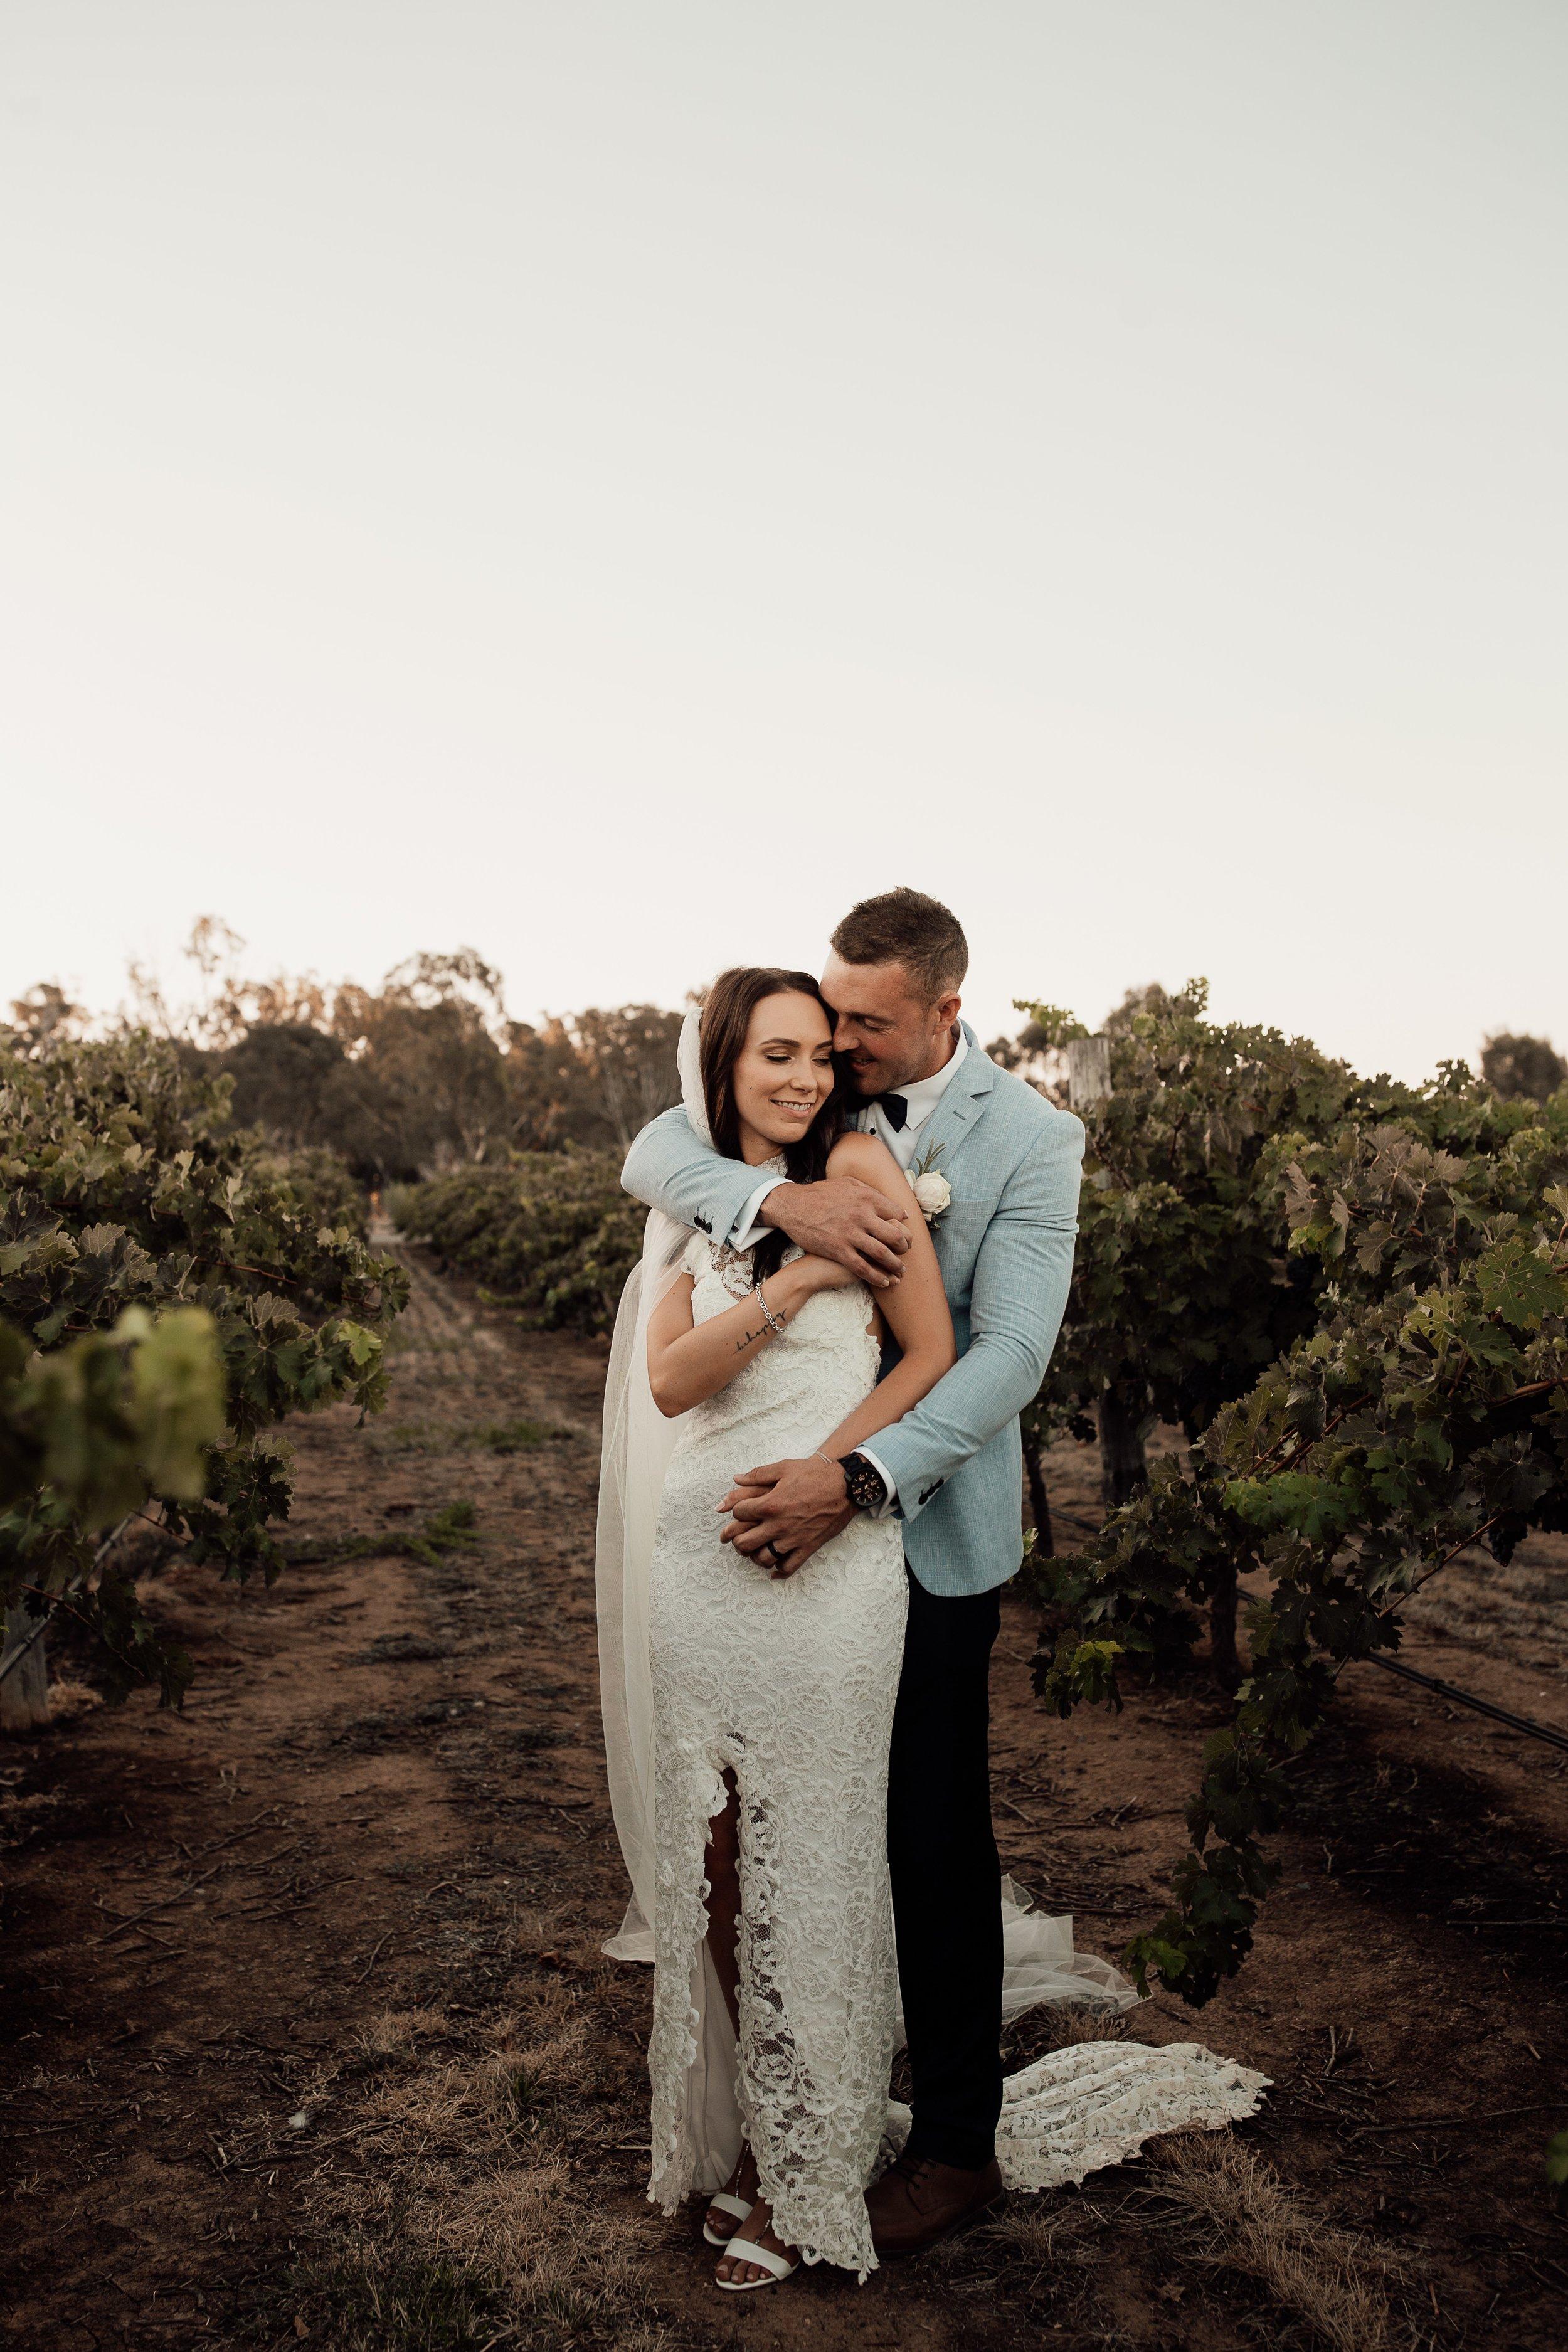 mickalathomas_puremacphotography_weddingphotographer_couplephotographer_Sheppartonphotographer_1475.jpg